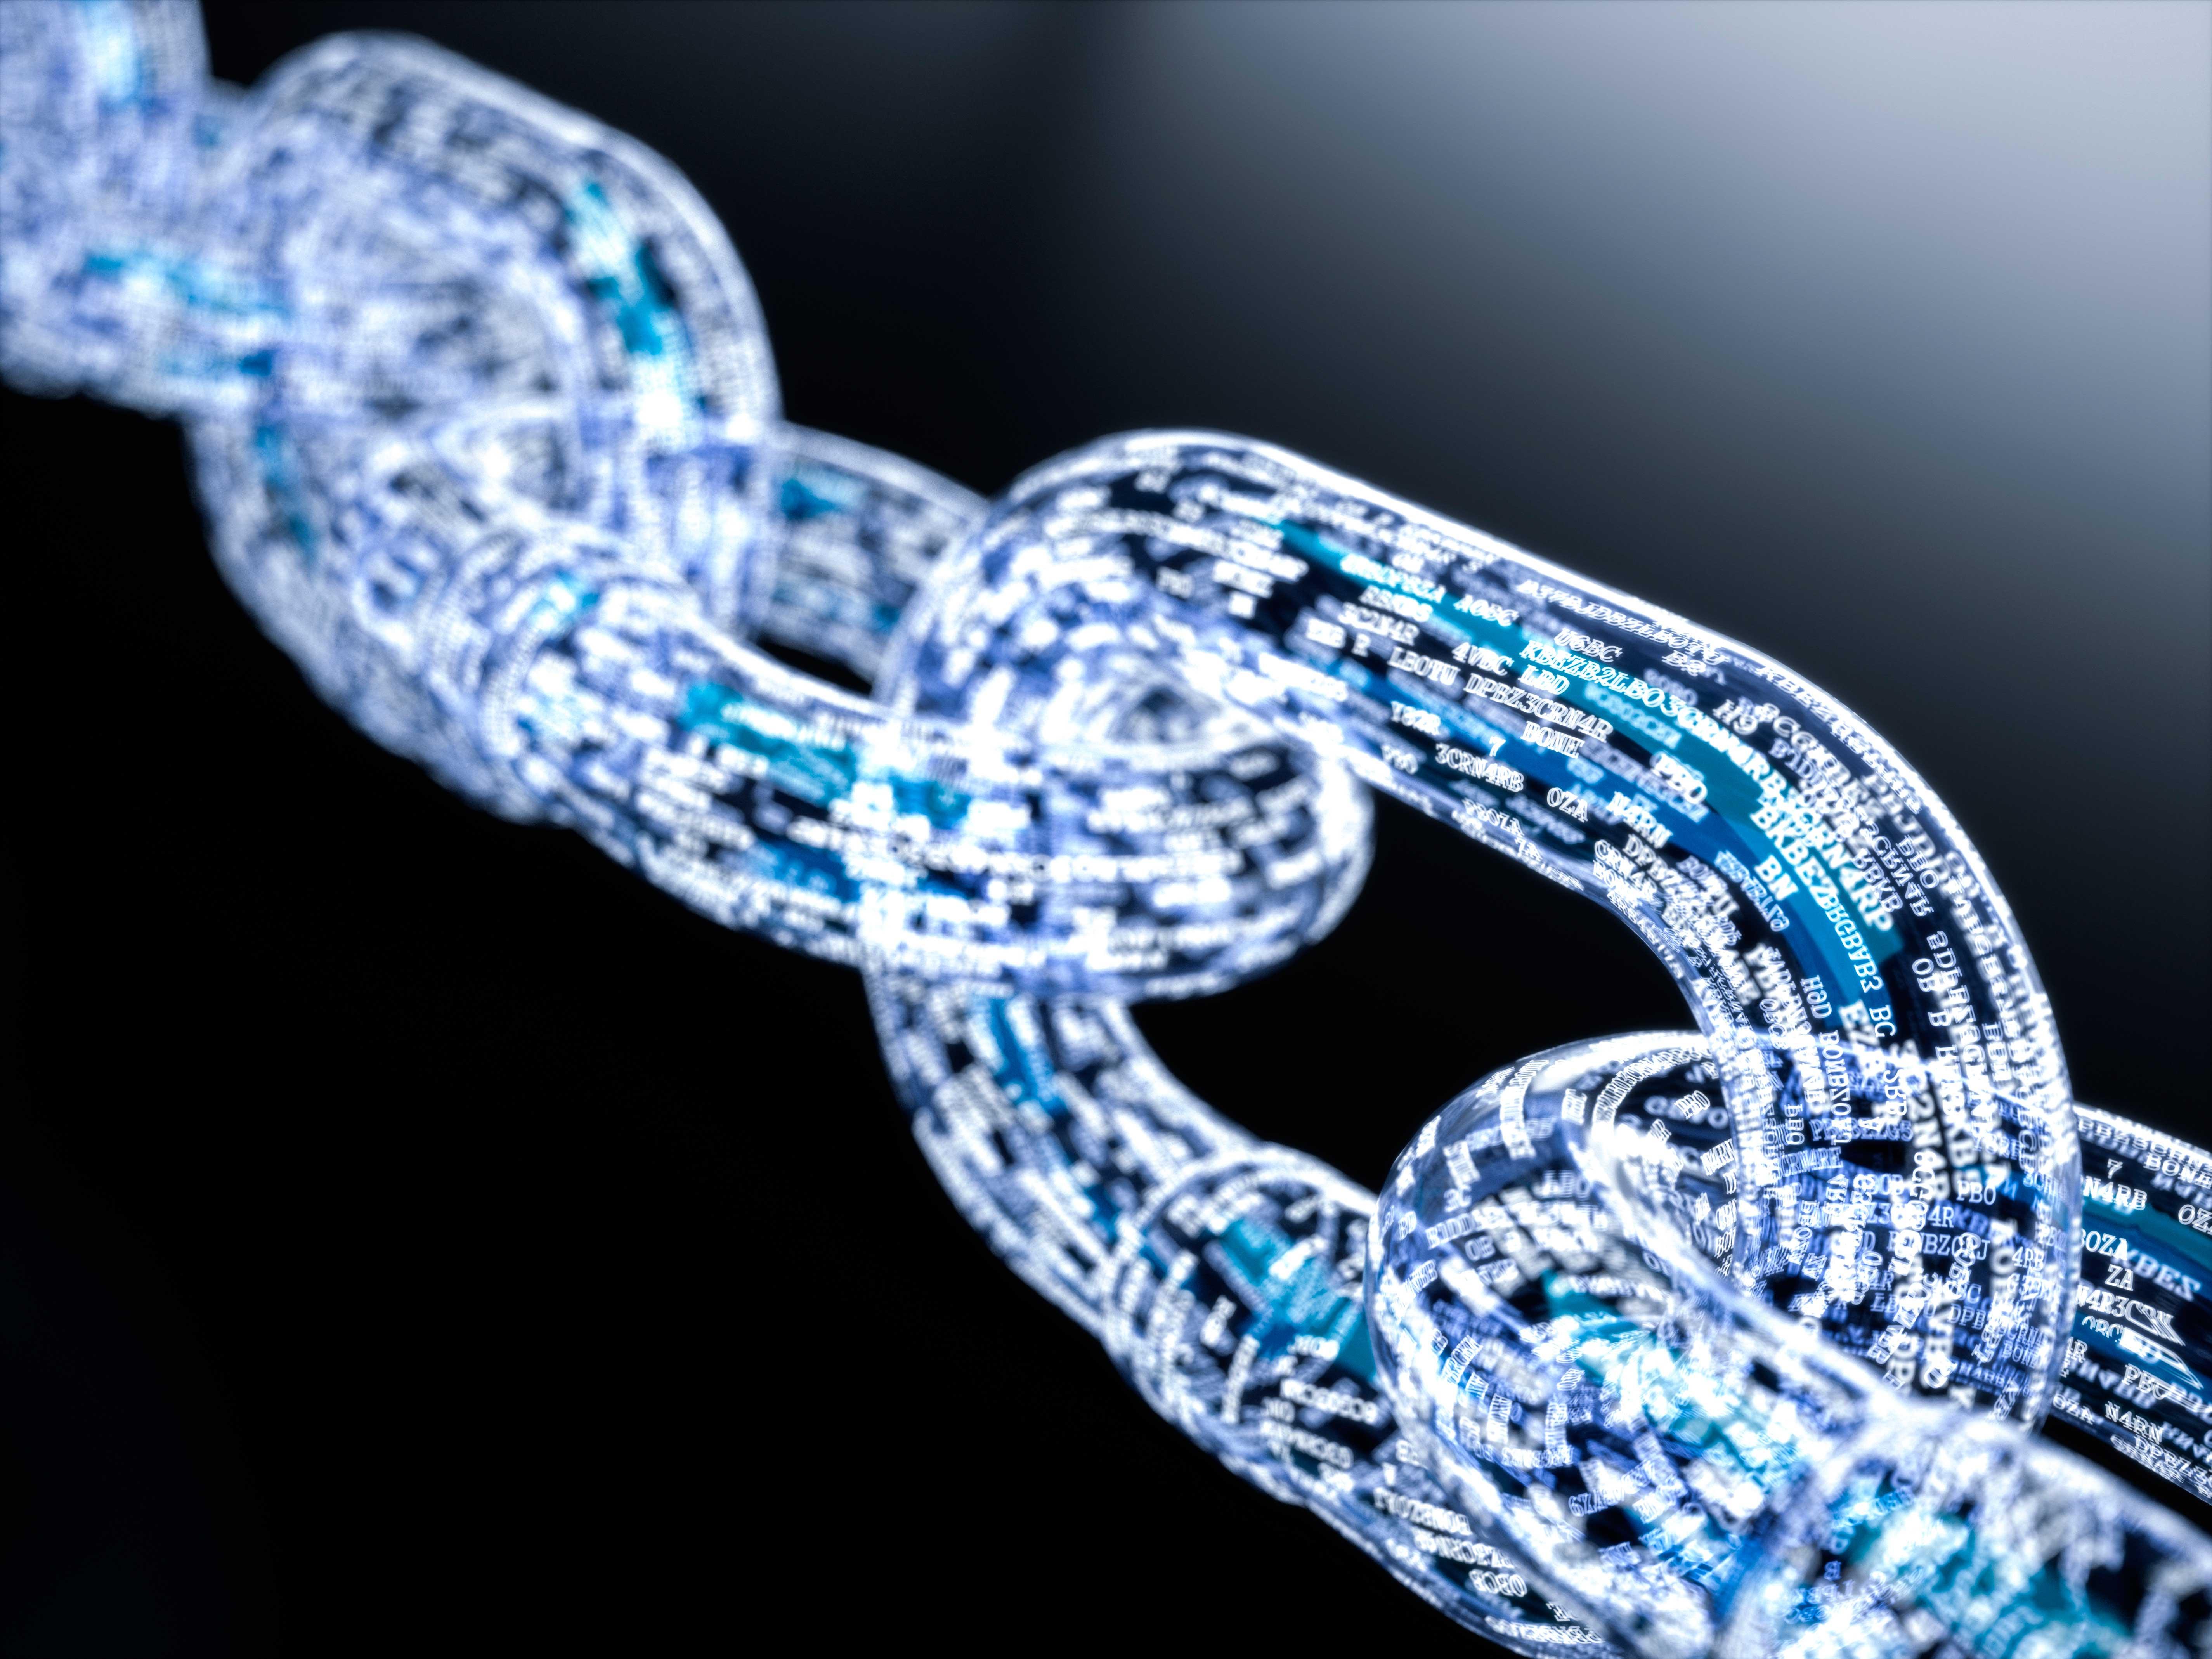 Improvements in blockchain-based business strategies